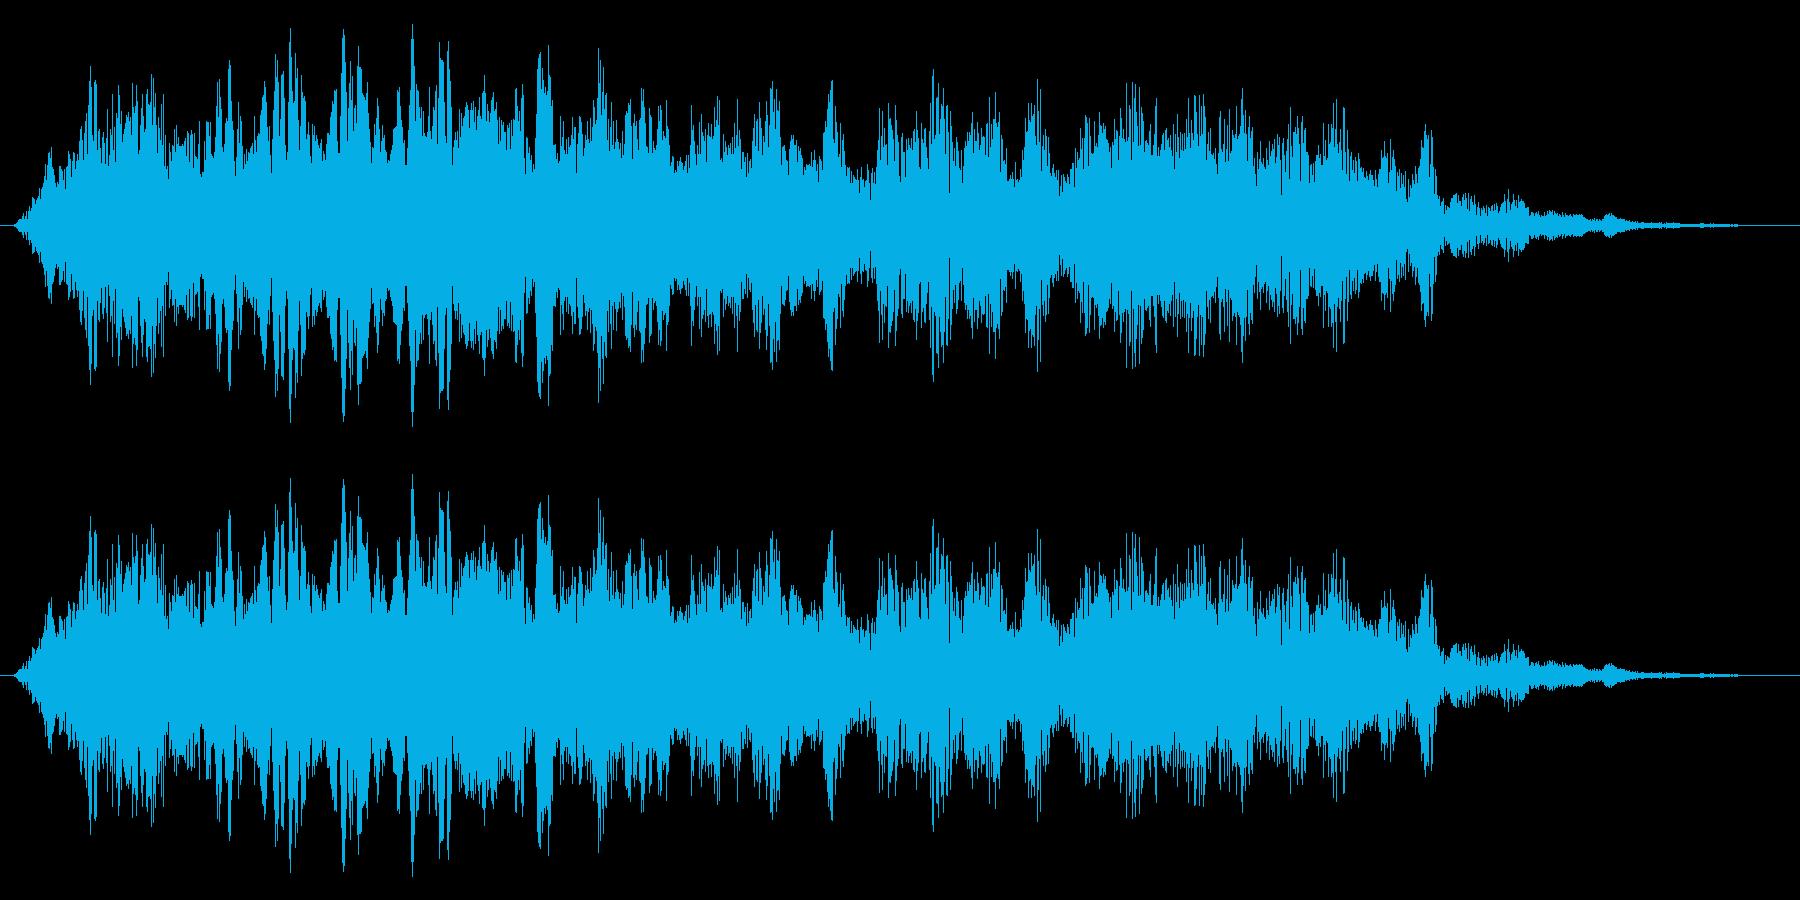 Masking effect :  the sound hidden in other sound